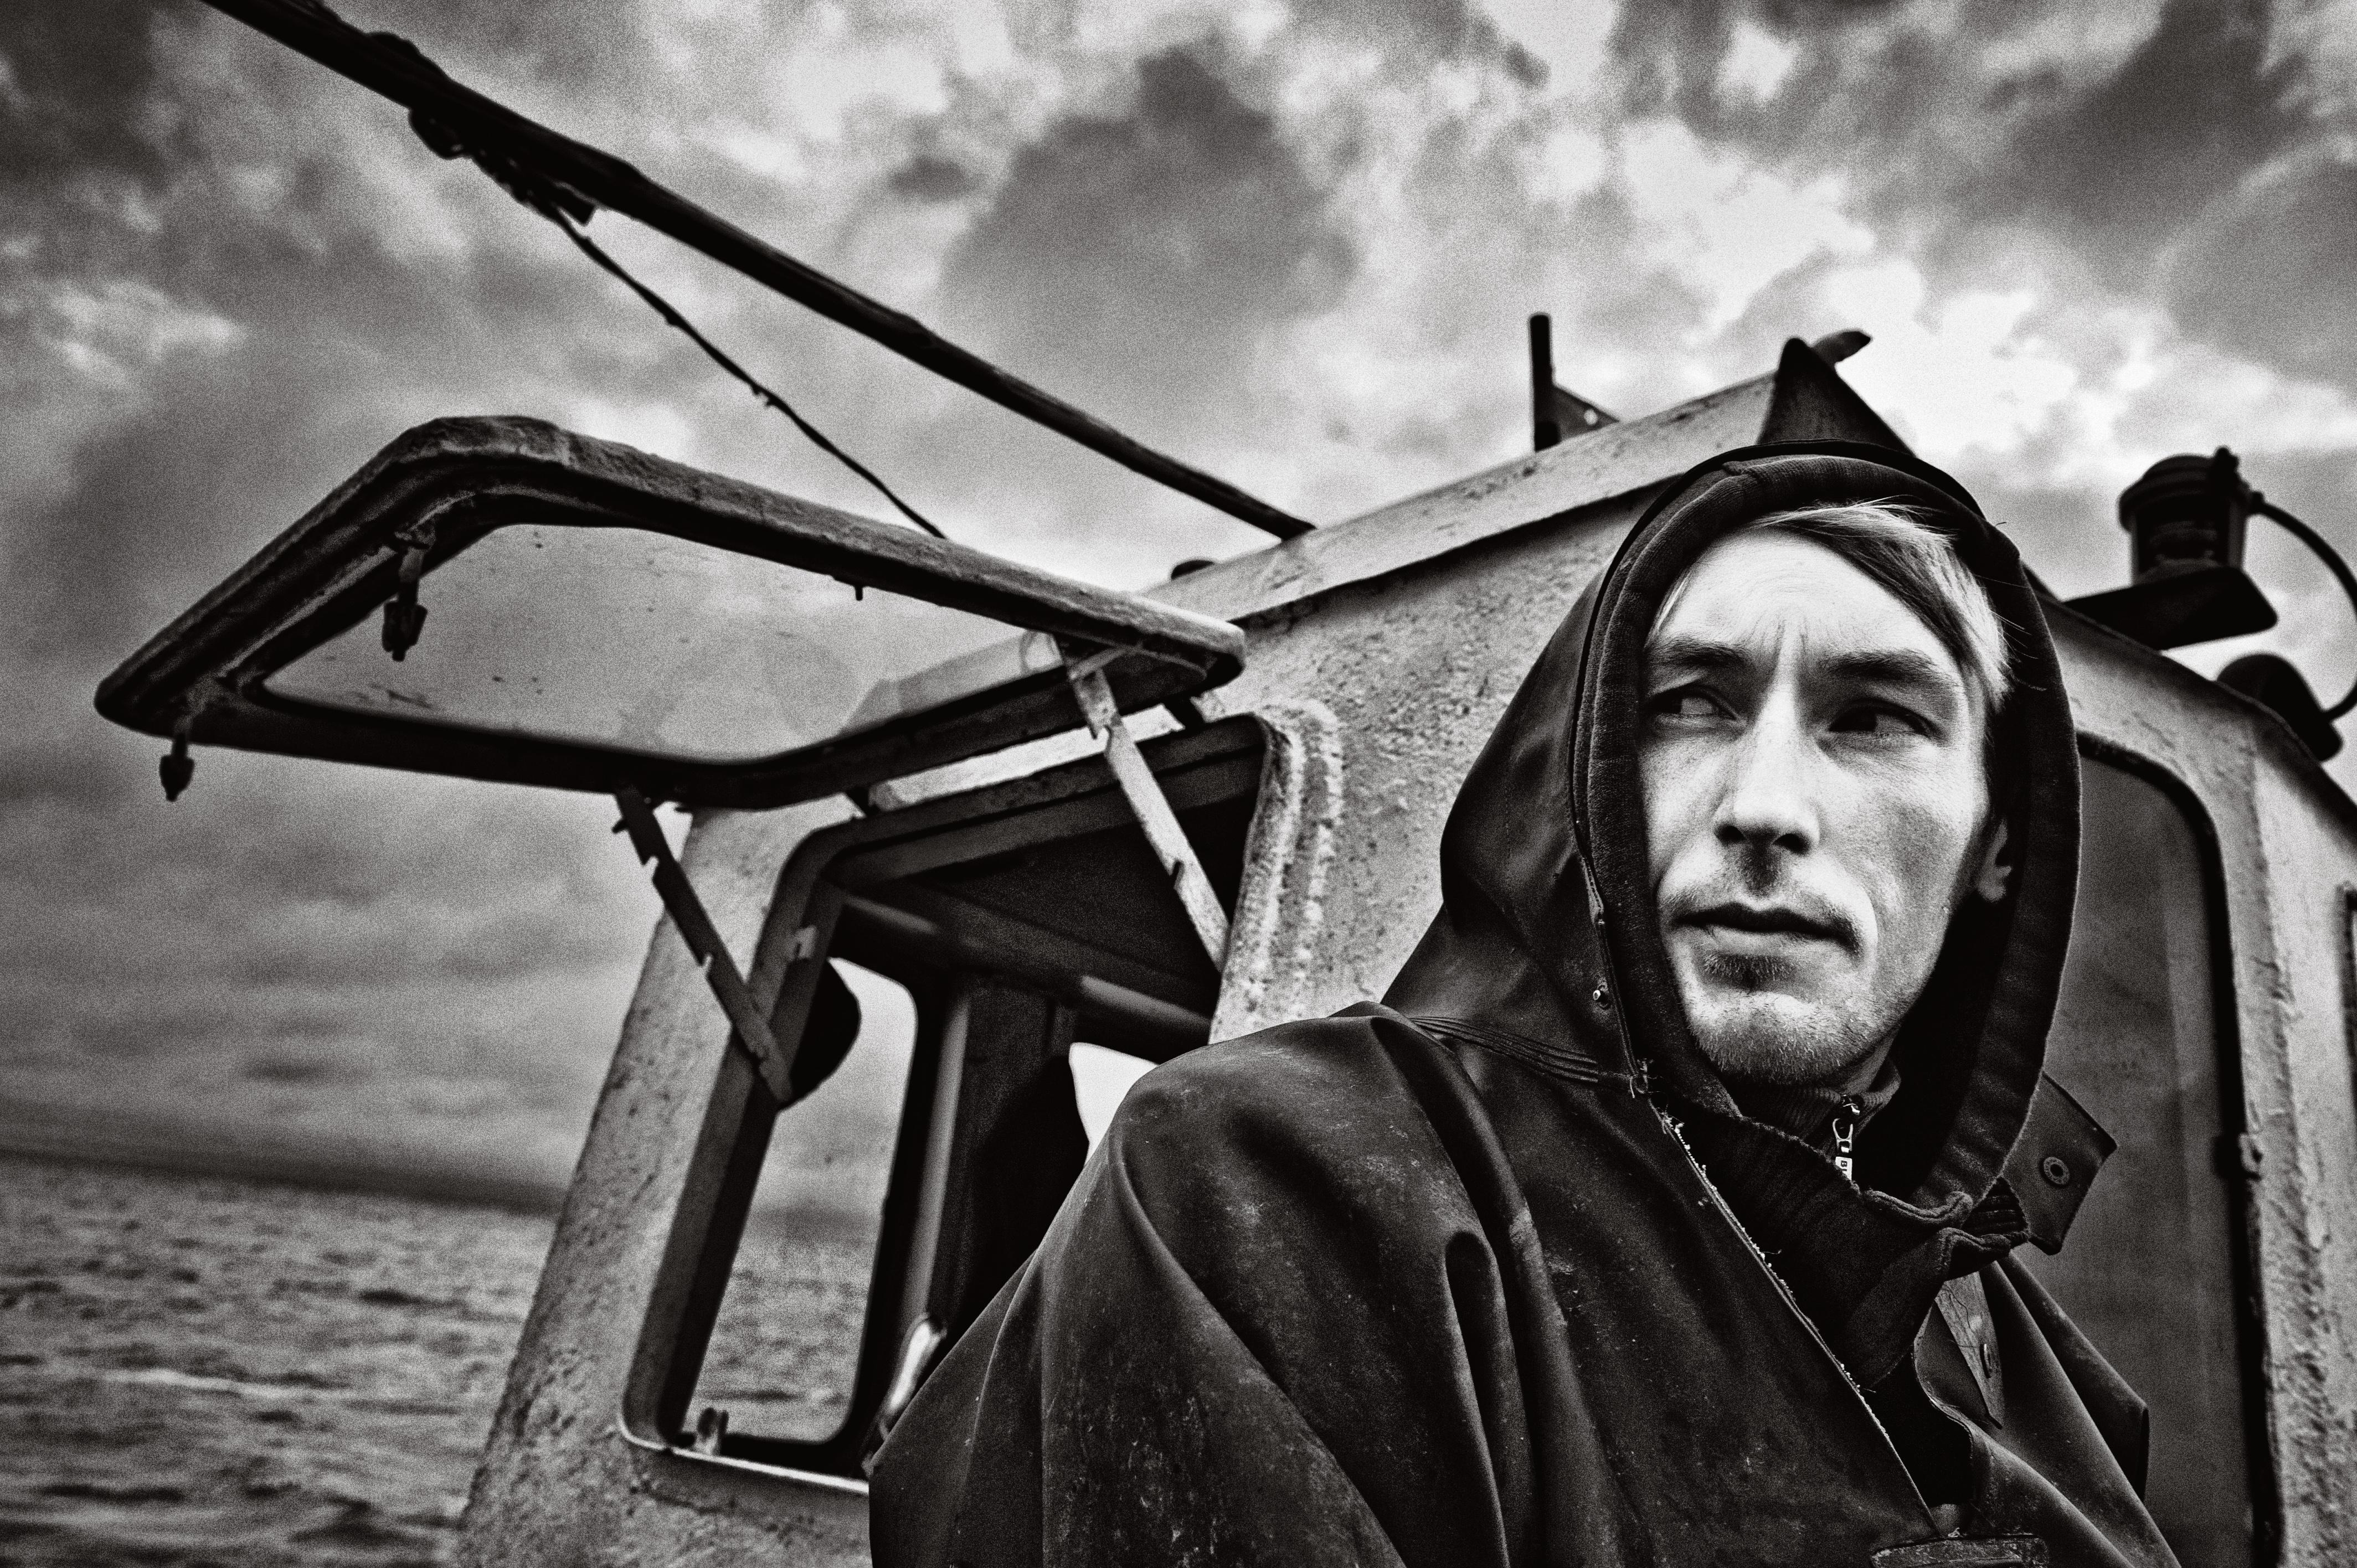 05 - © Dmitri Leltschuk - Editions Noir sur Blanc